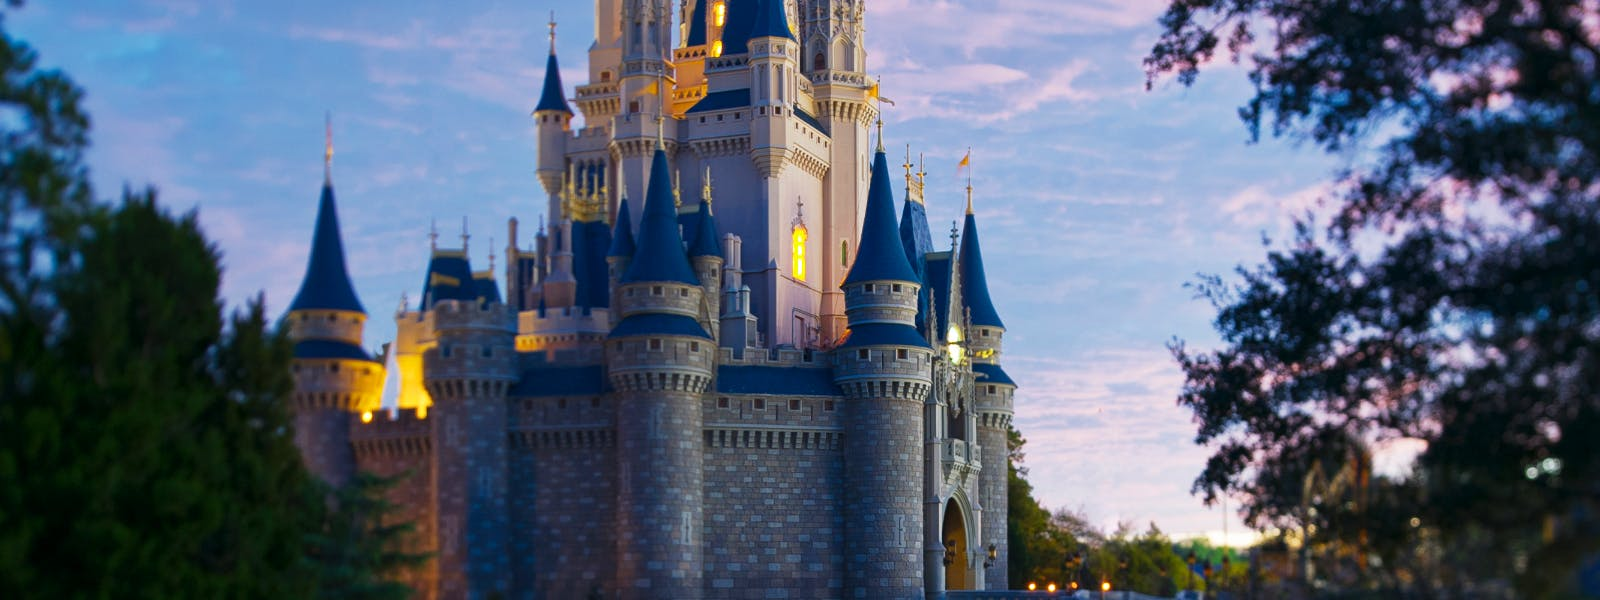 Wondrous Villas Vacation Homes Walt Disney World Area Magical Short Links Chair Design For Home Short Linksinfo